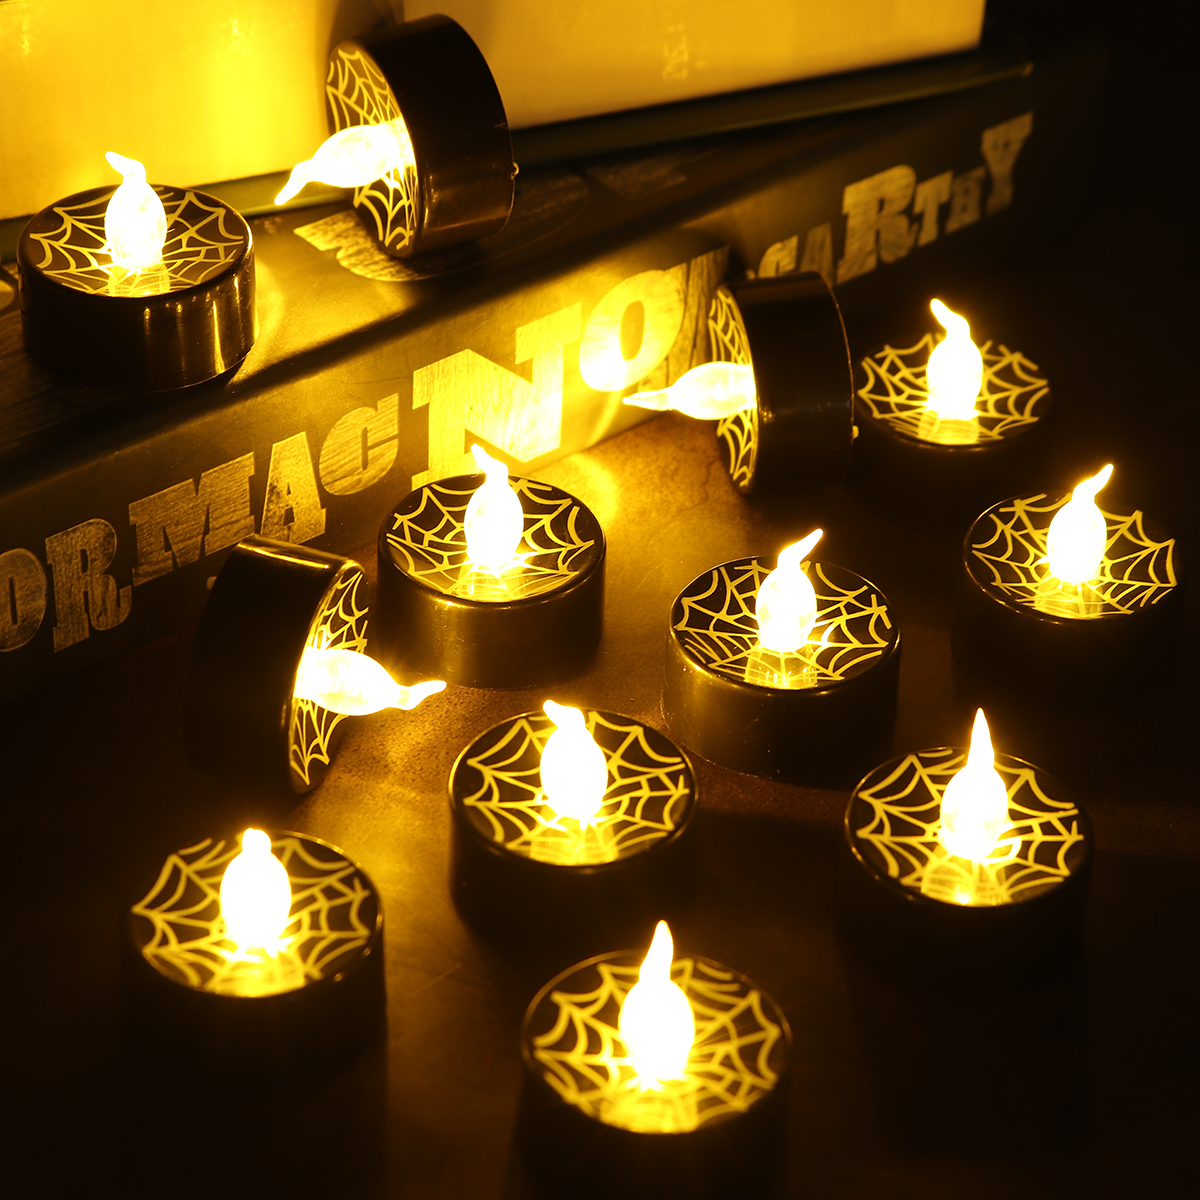 12Pcs LED Tea Lights Battery Operated Flickering Flameless Candles Halloween Pumpkin